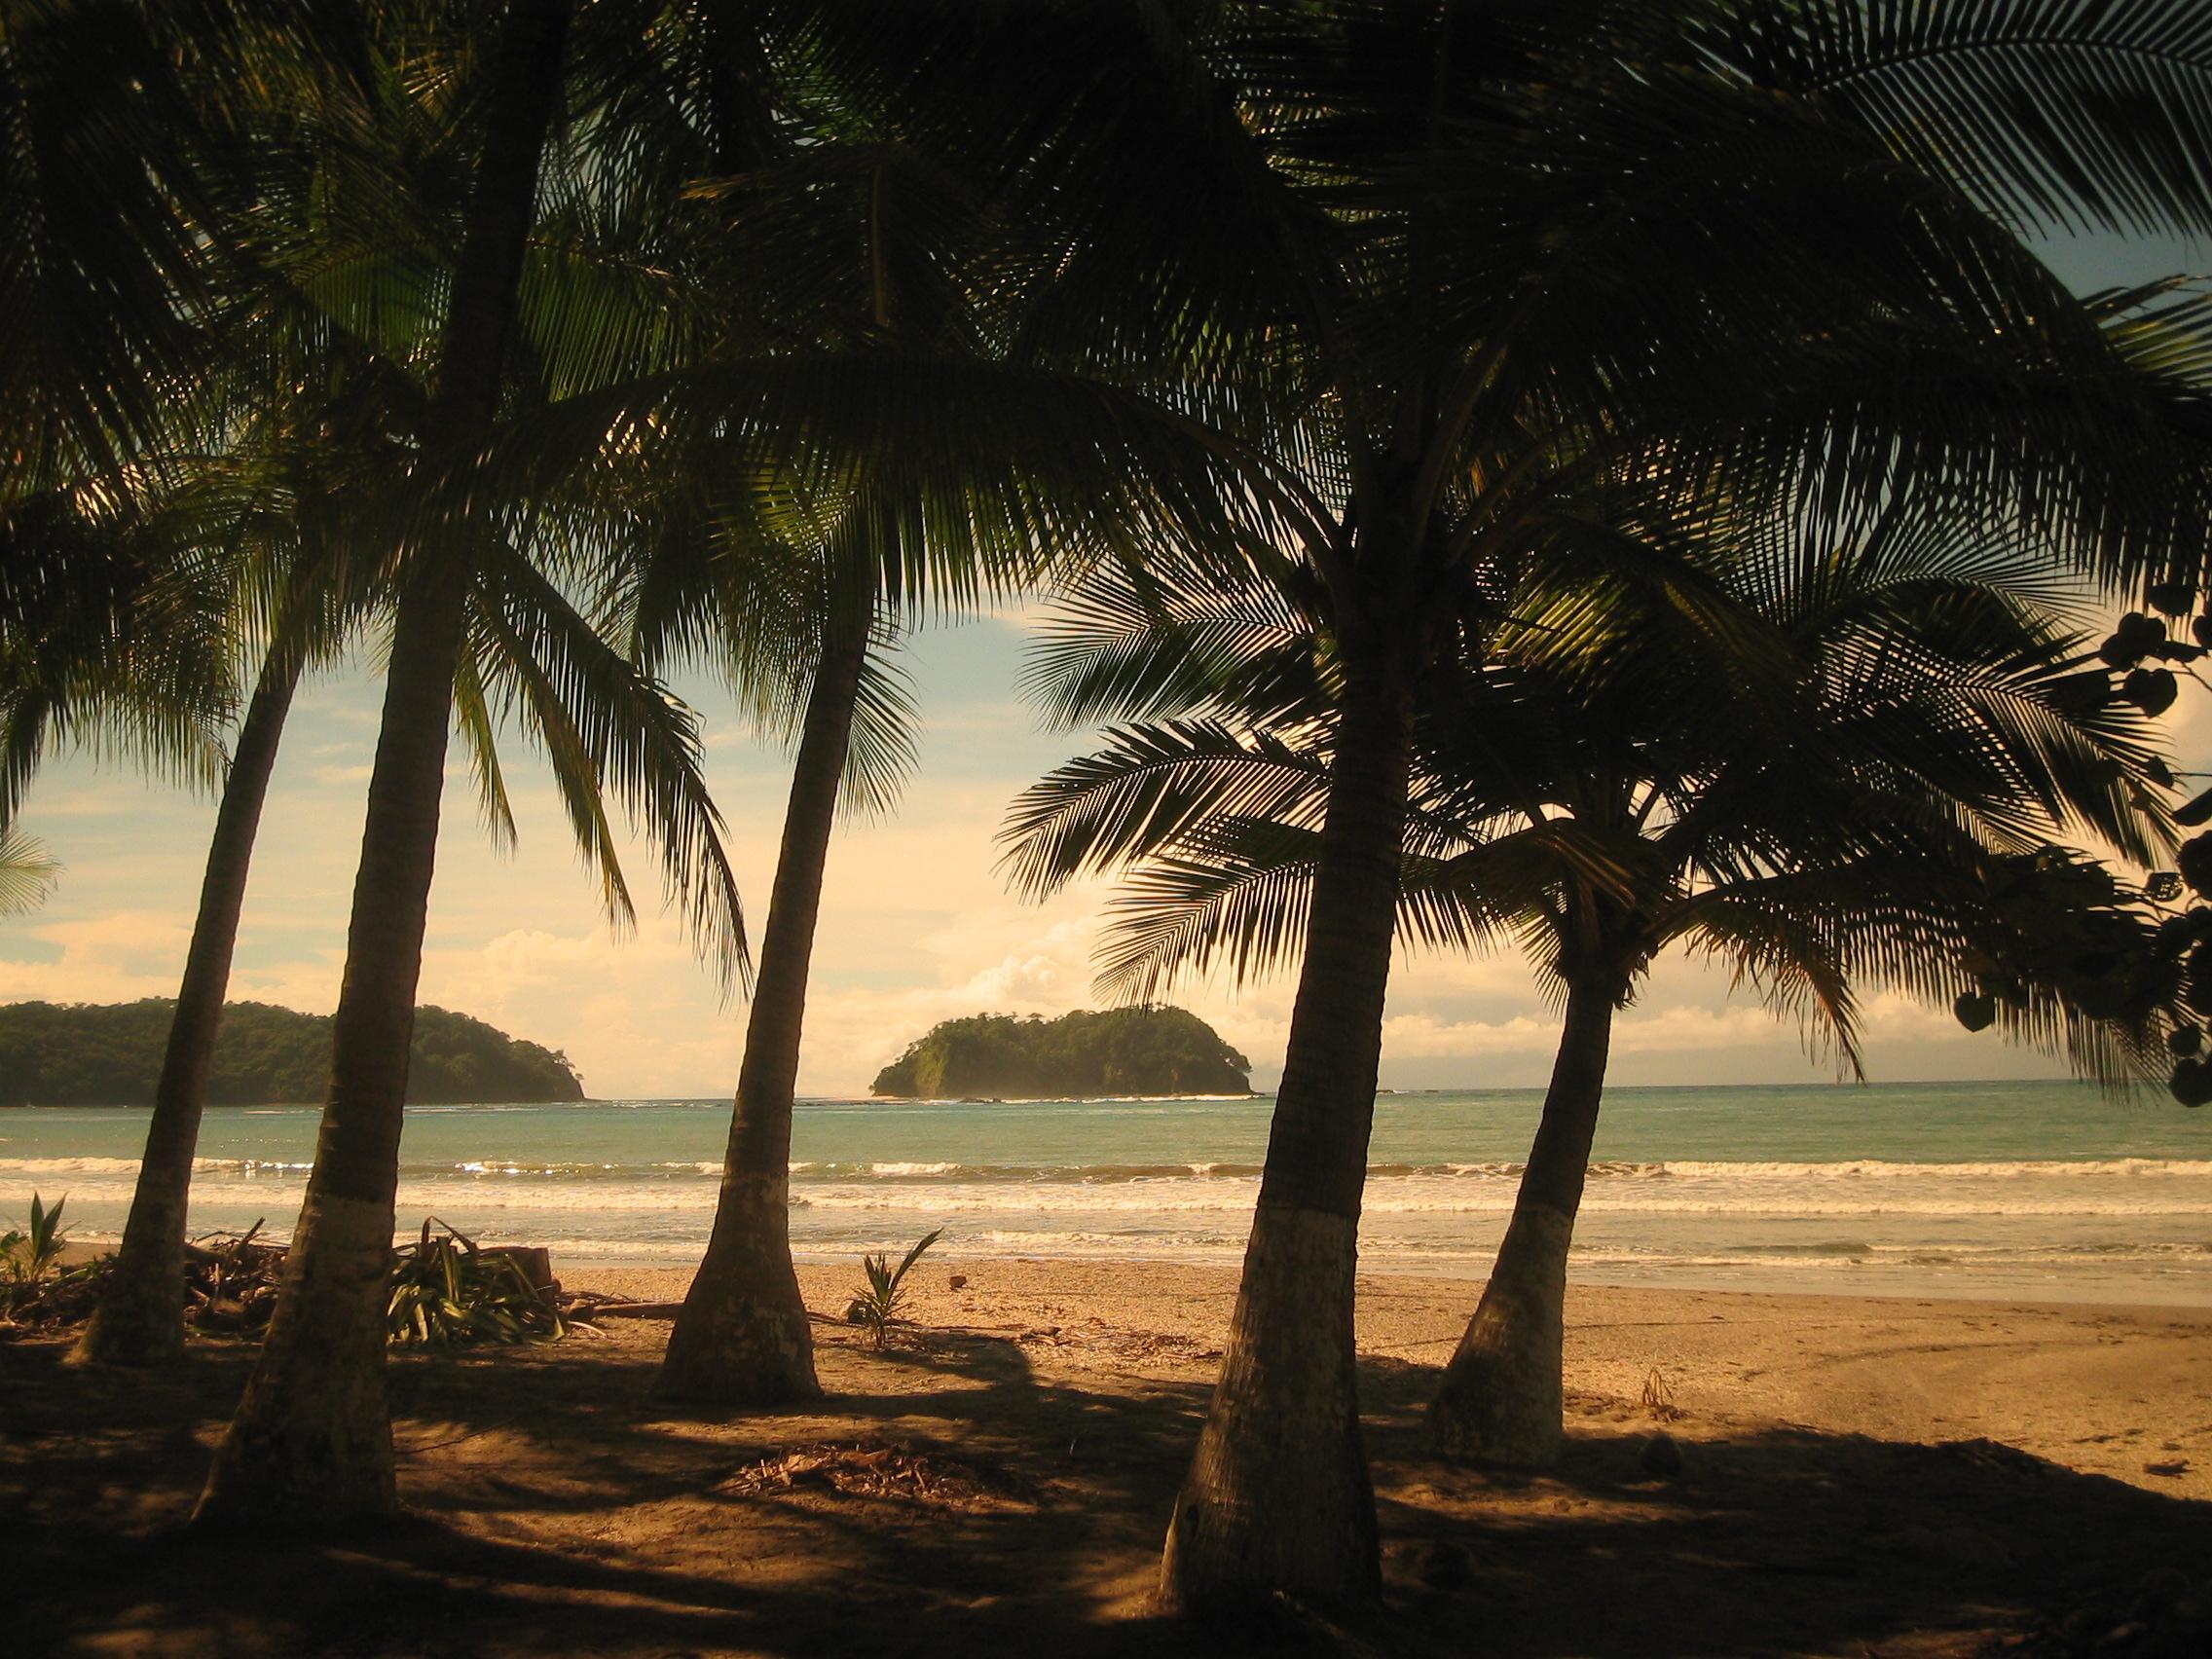 bigstock-Costa-Rica-Beach-5469215.jpg